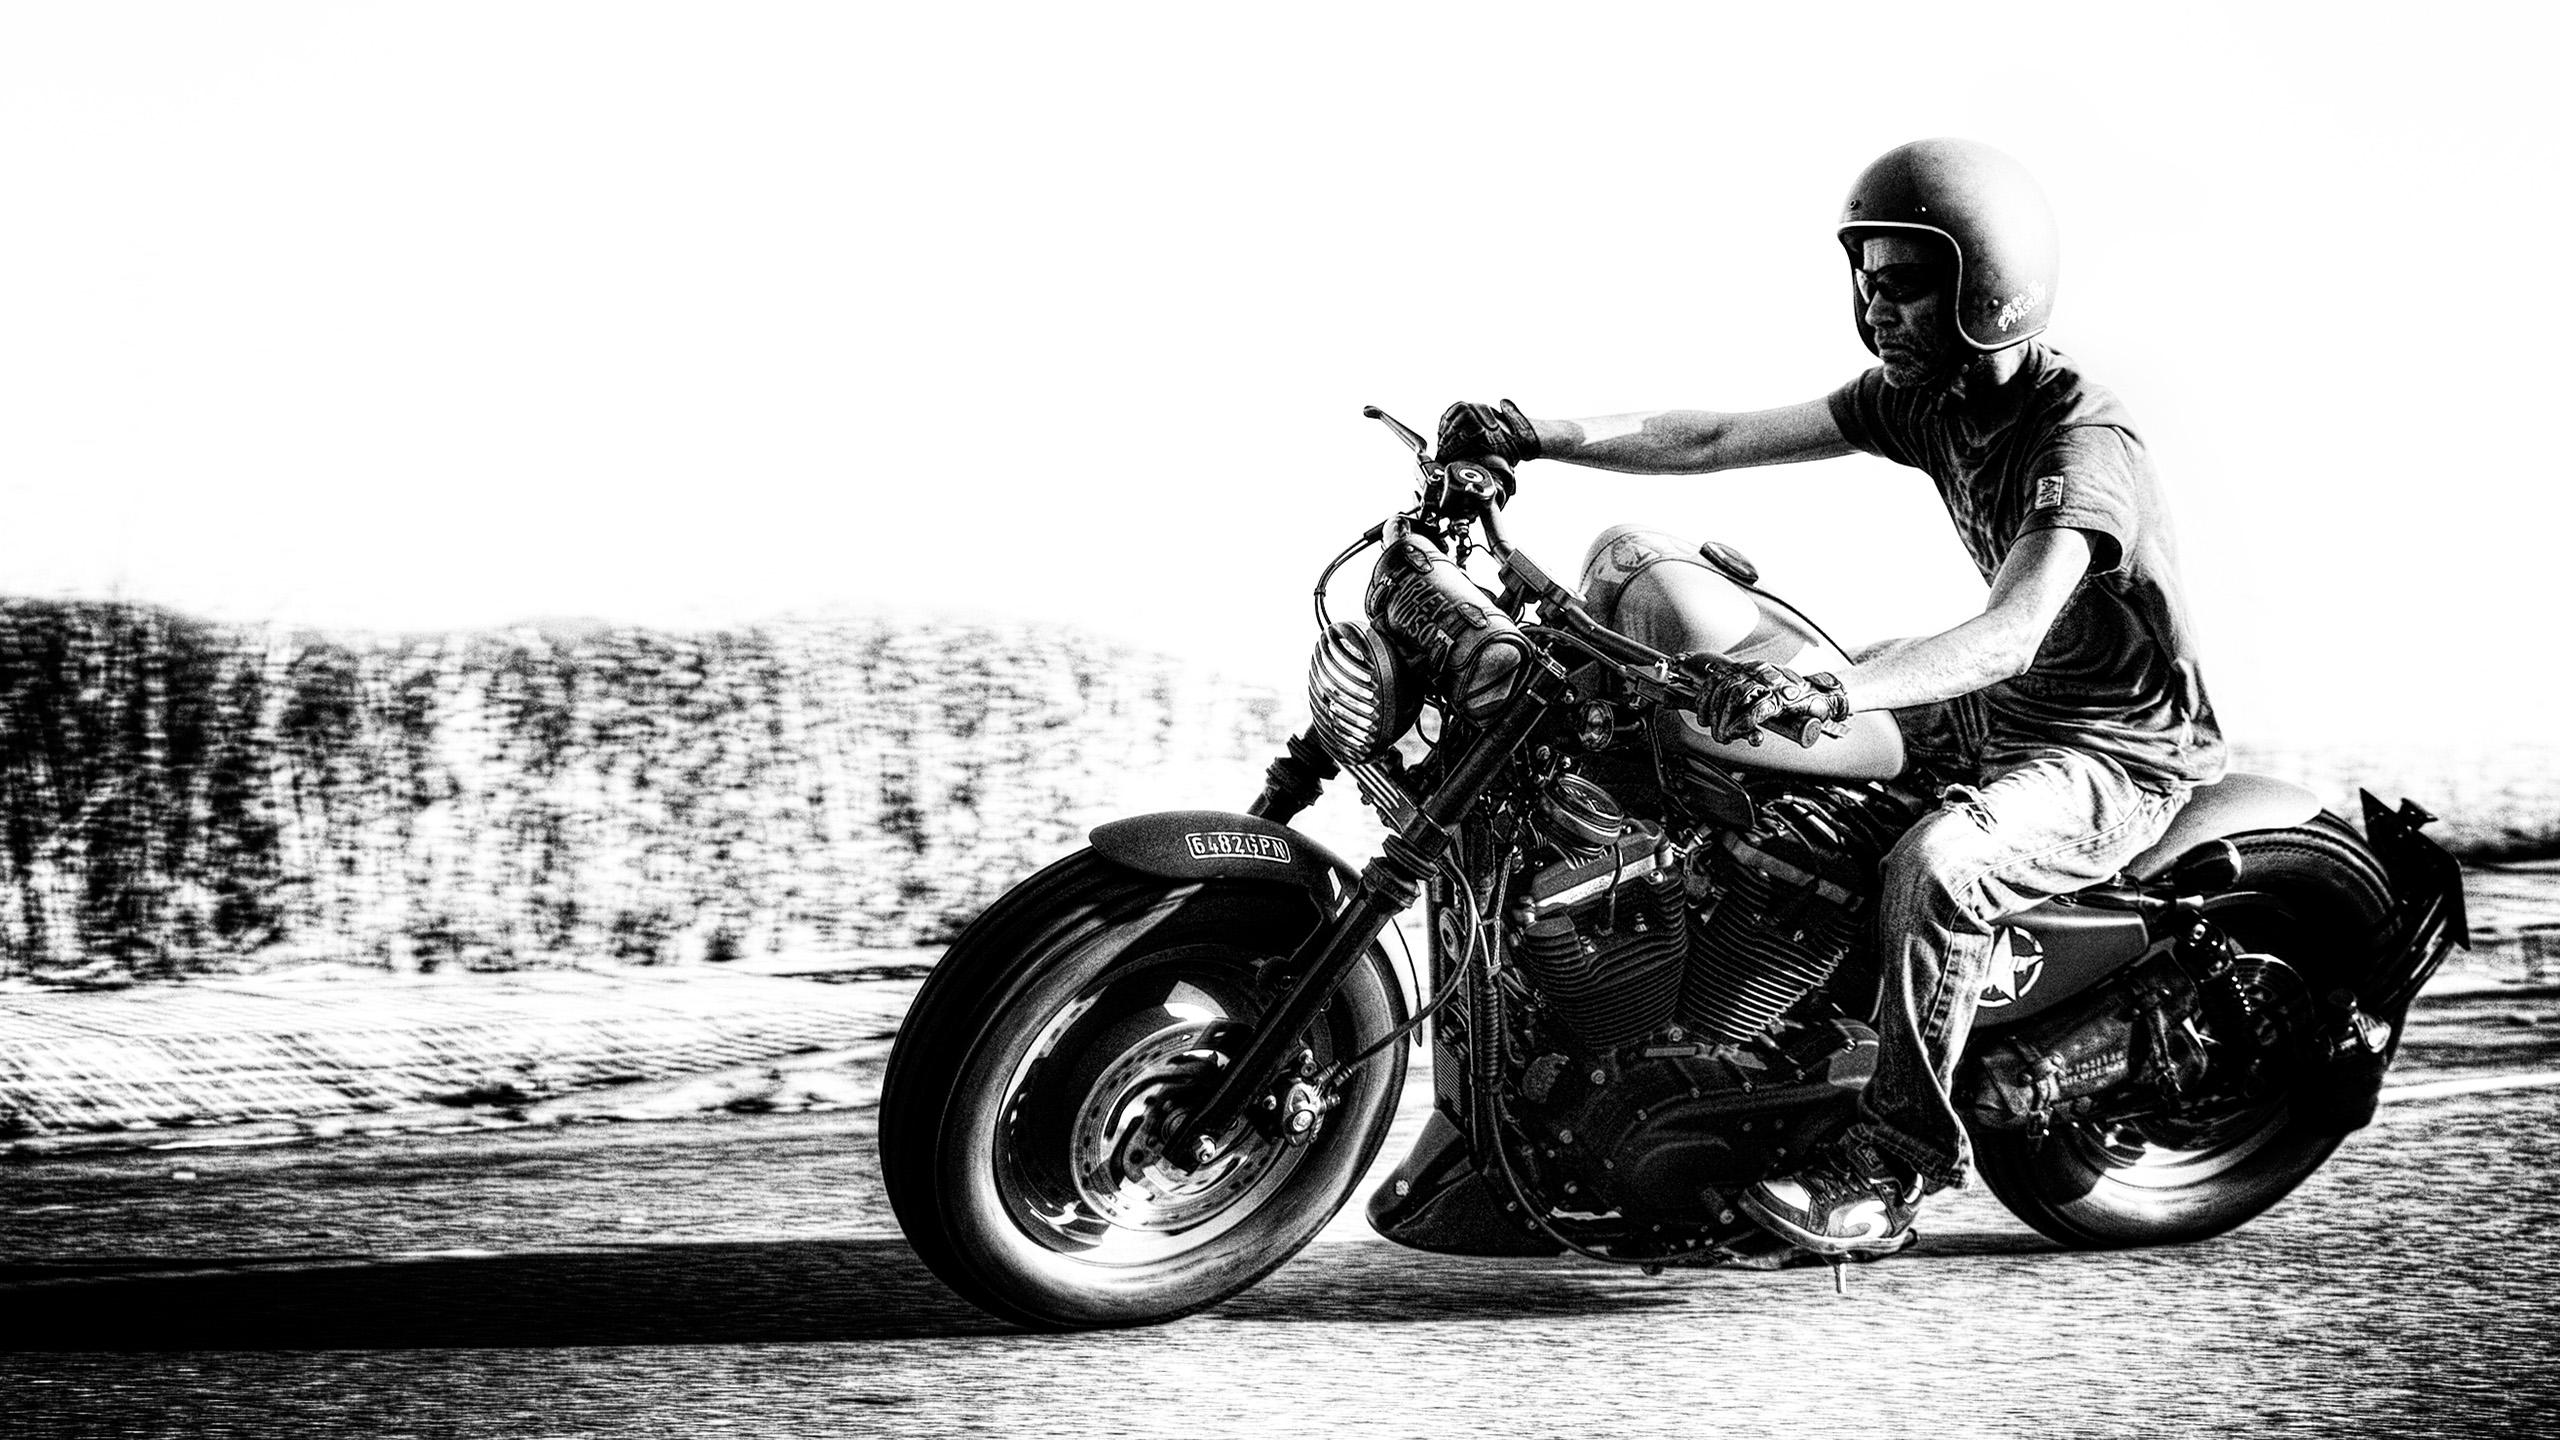 Harley Davidson 883 Iron Army 4